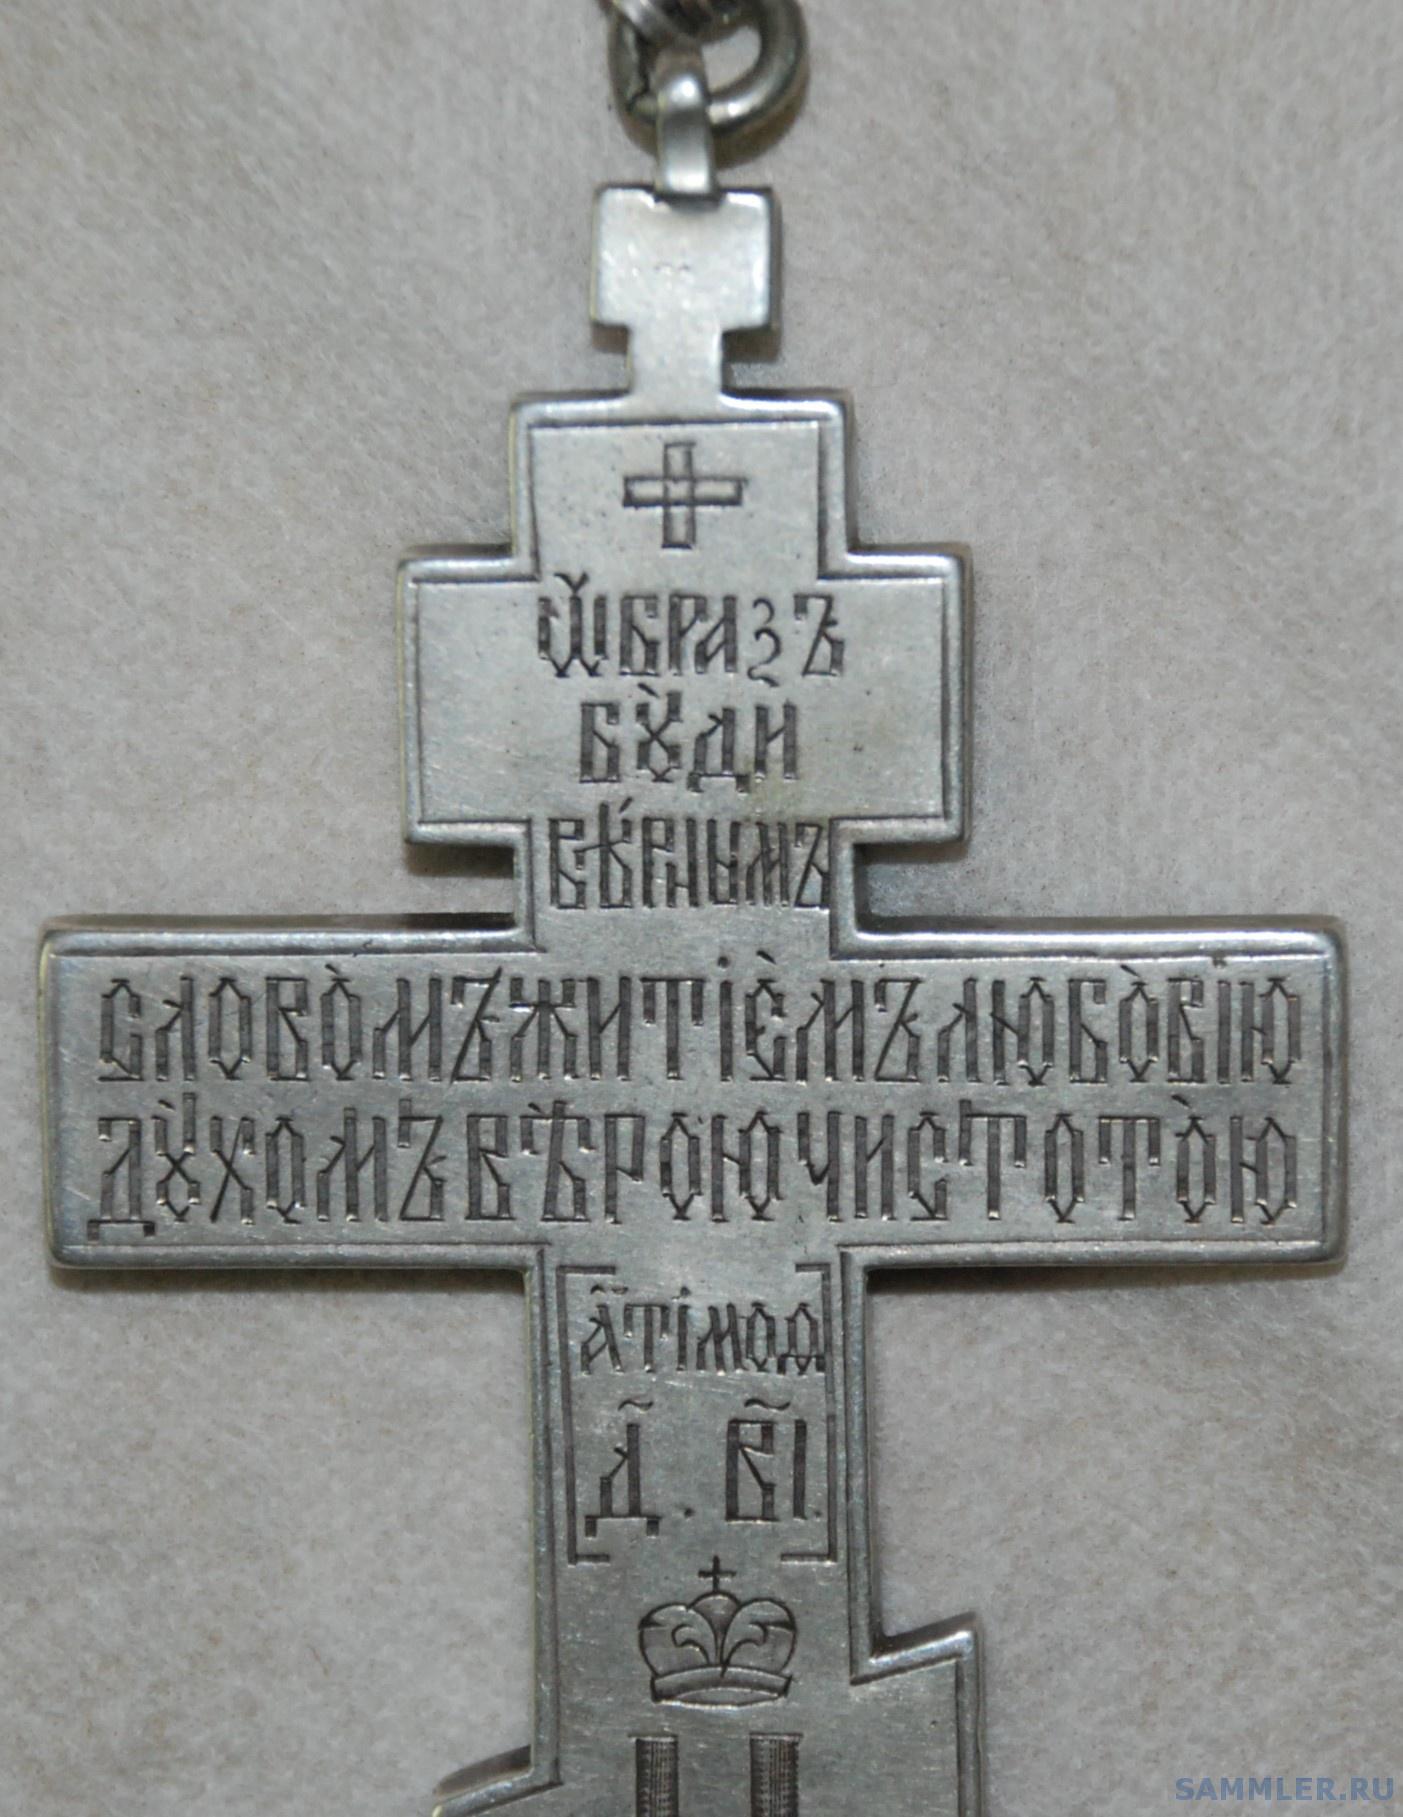 DSC_6366.JPG